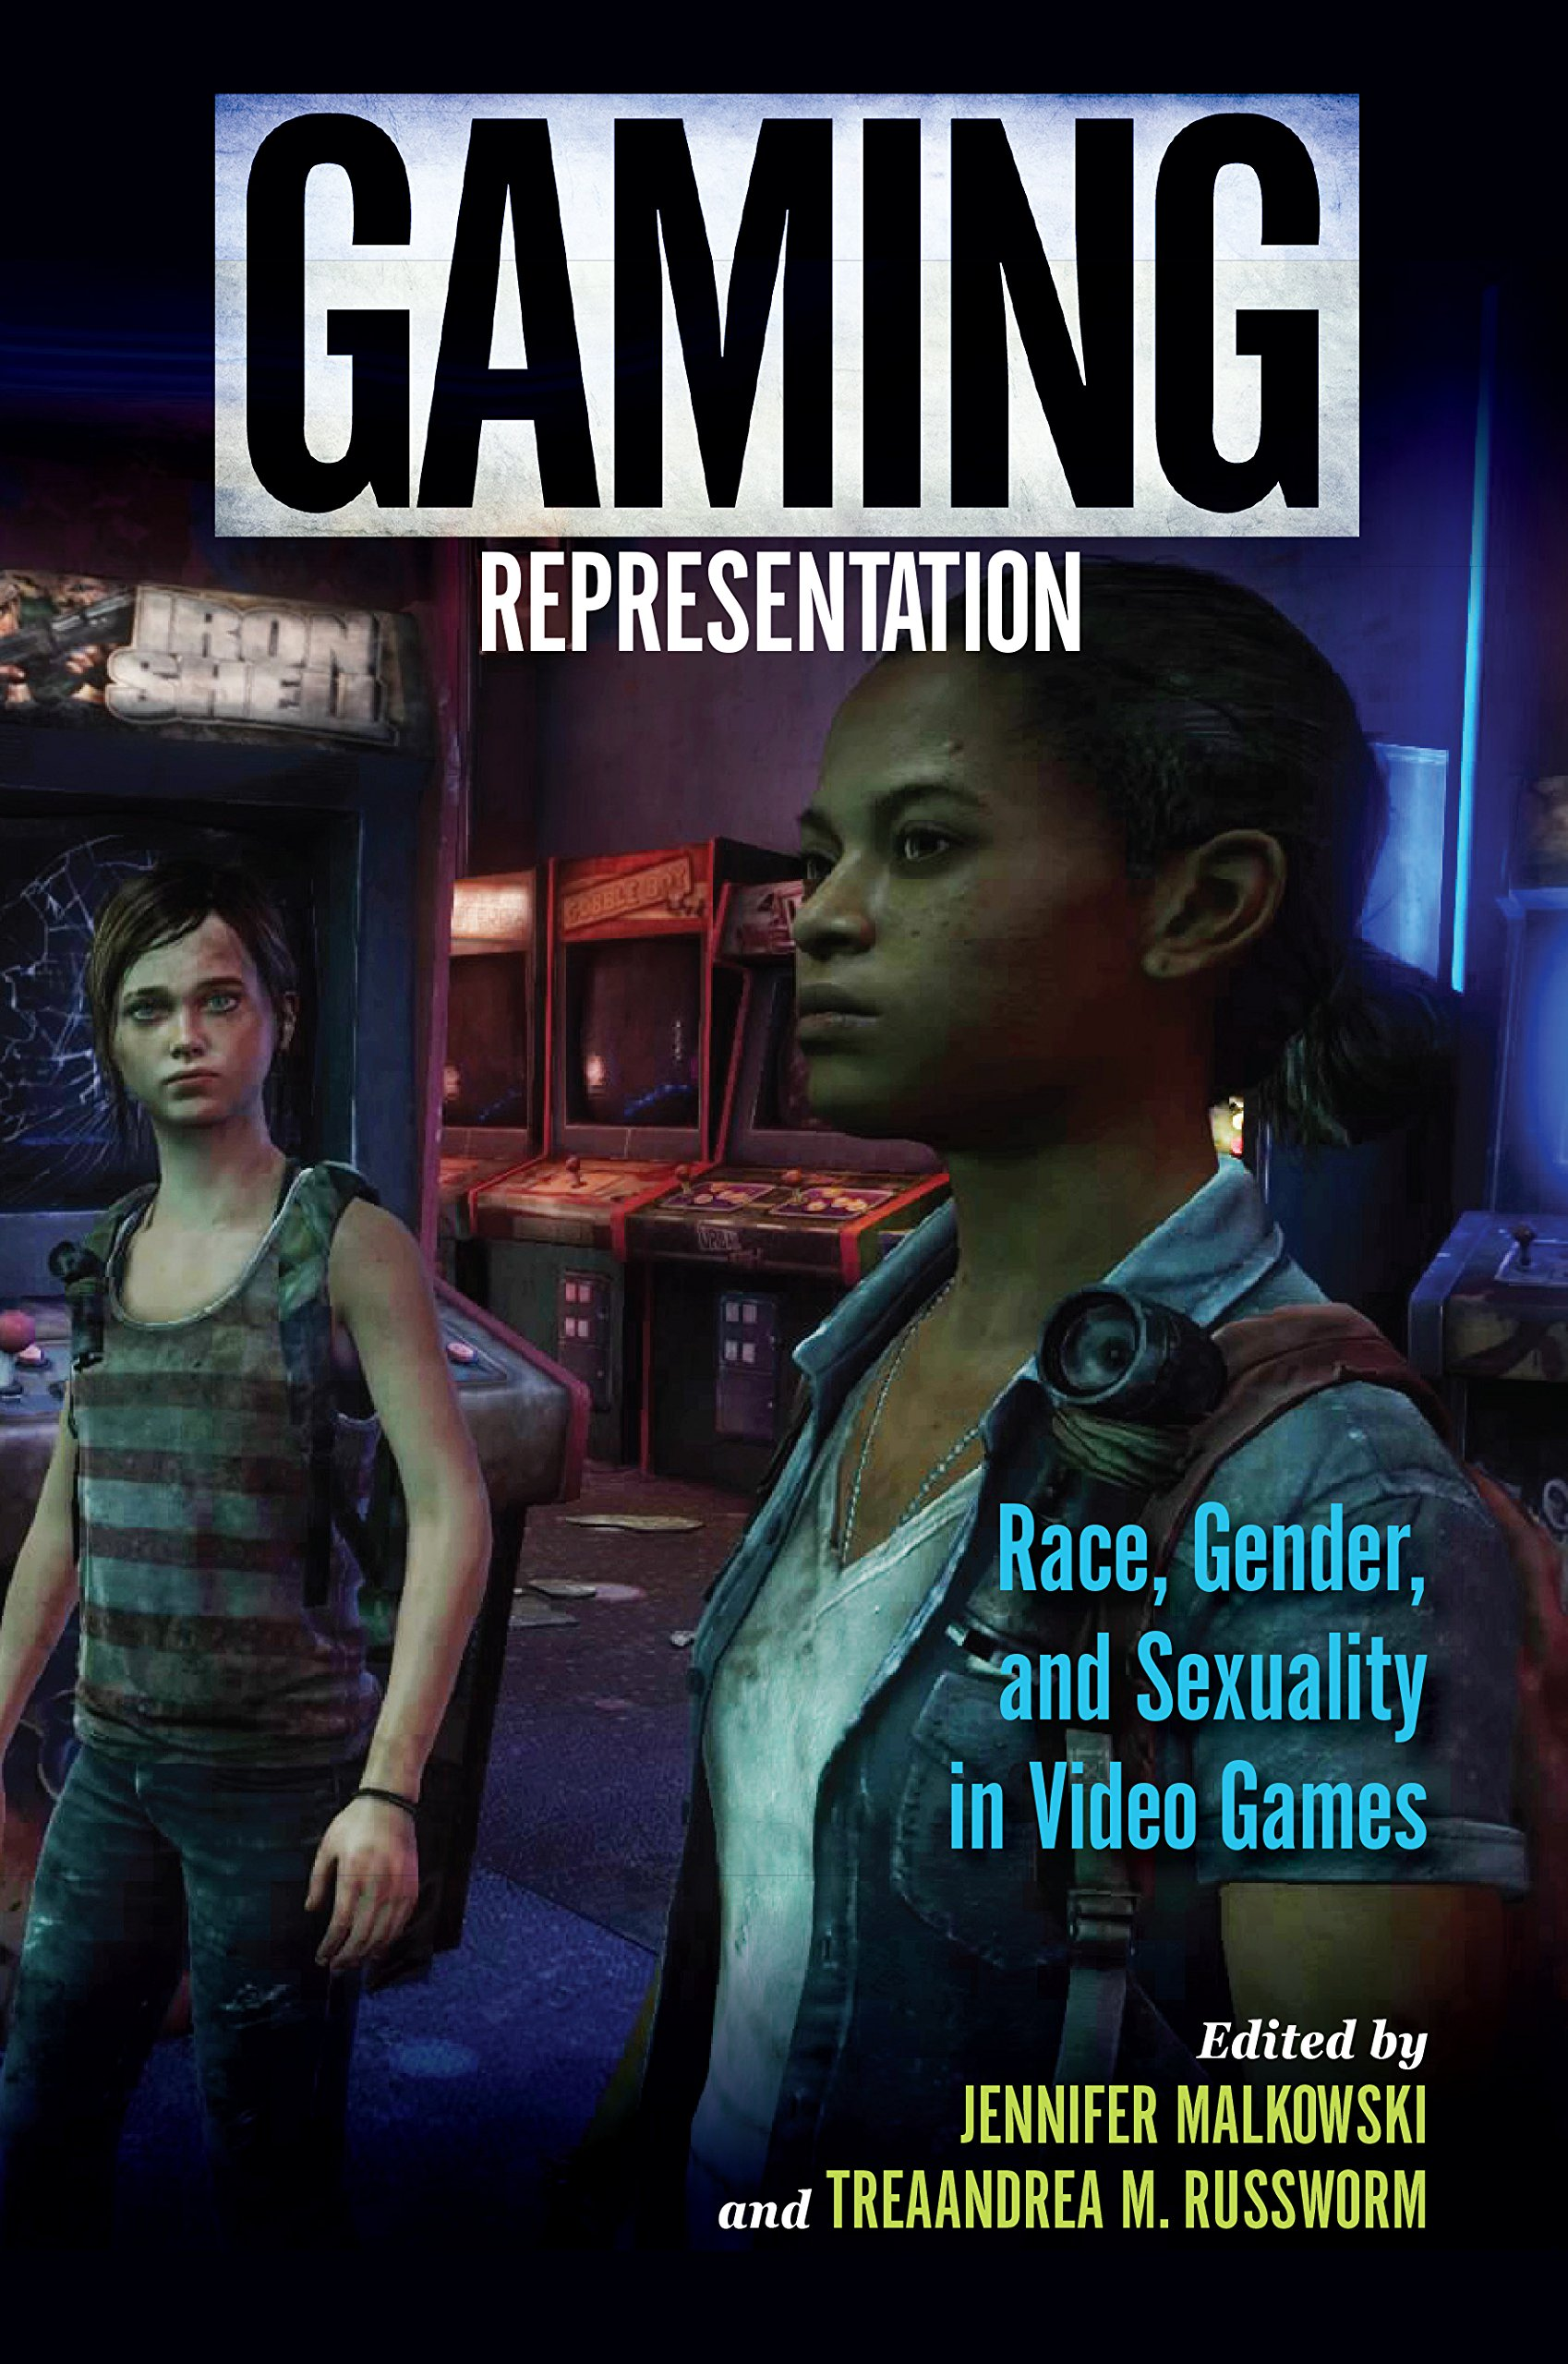 Gaming Representation: Race, Gender, and Sexuality in Video Games (Digital Game Studies) ebook